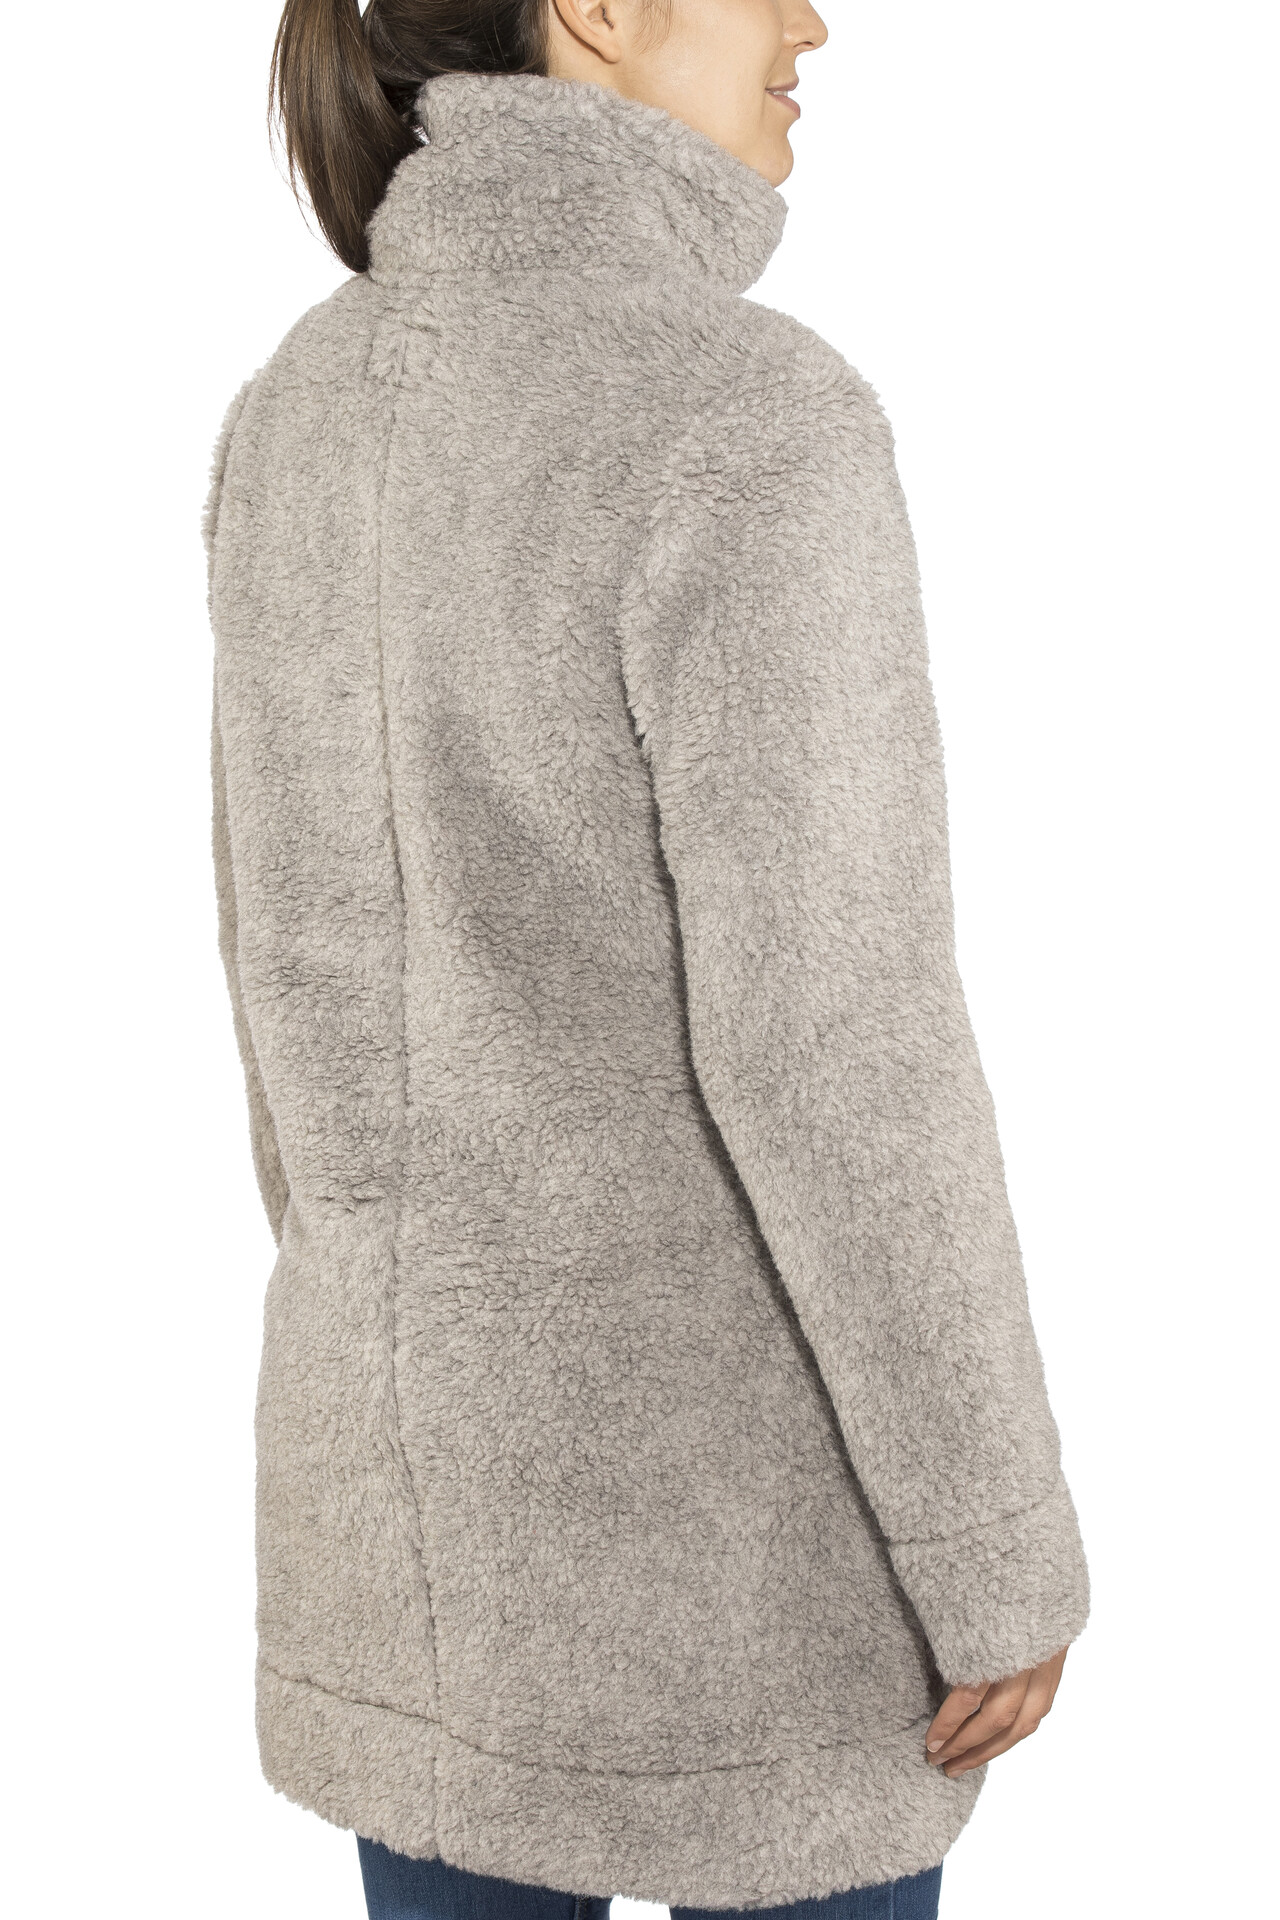 Bergans Oslo Wool Loosefit Jacket grijs